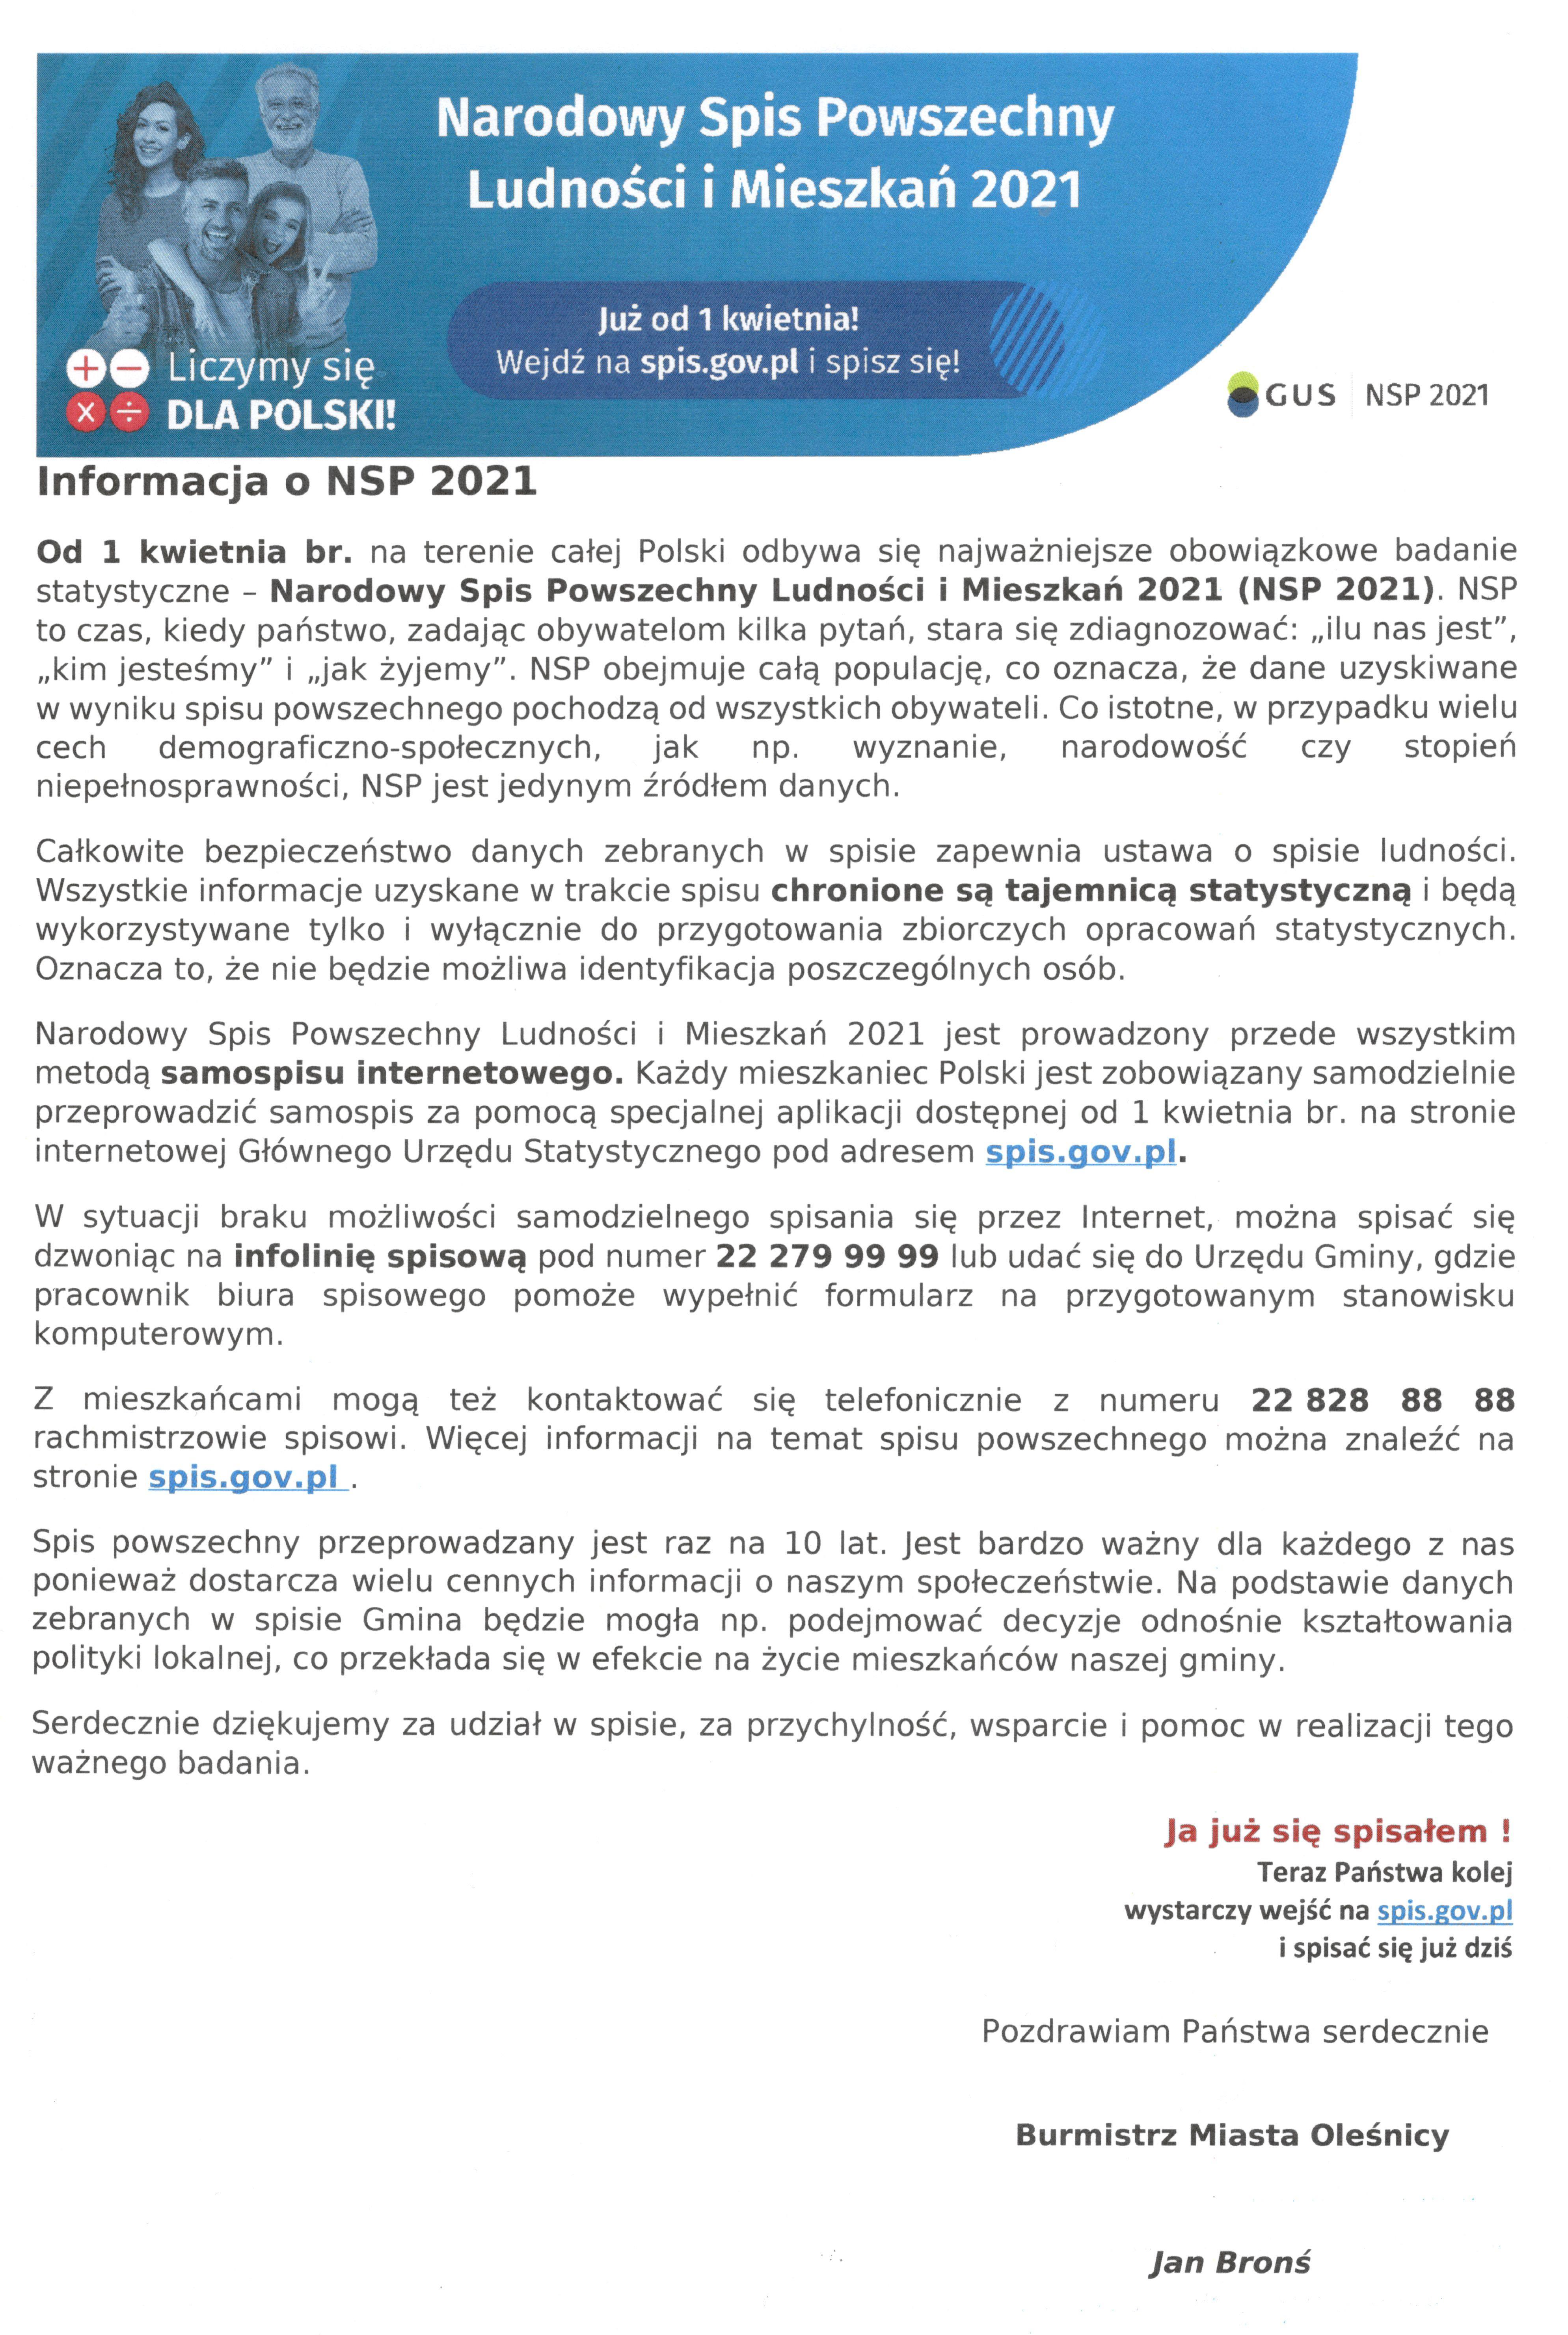 NSP - informacja na stronę